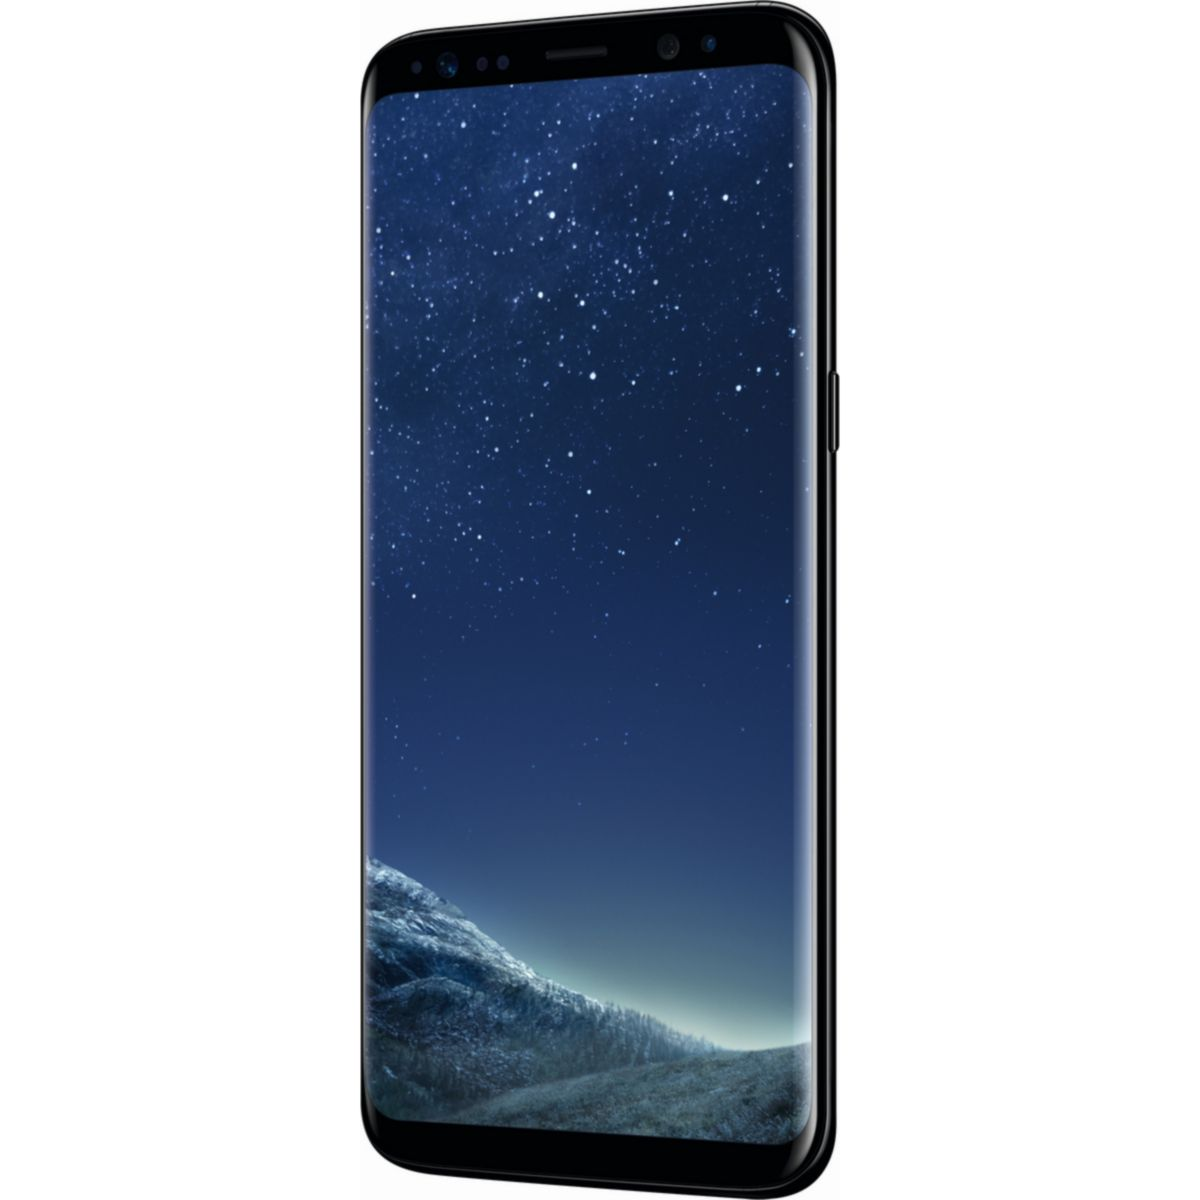 Samsung Galaxy S8 G950F 64GB LTE midnight black Smartphone - DE Ware - broschei